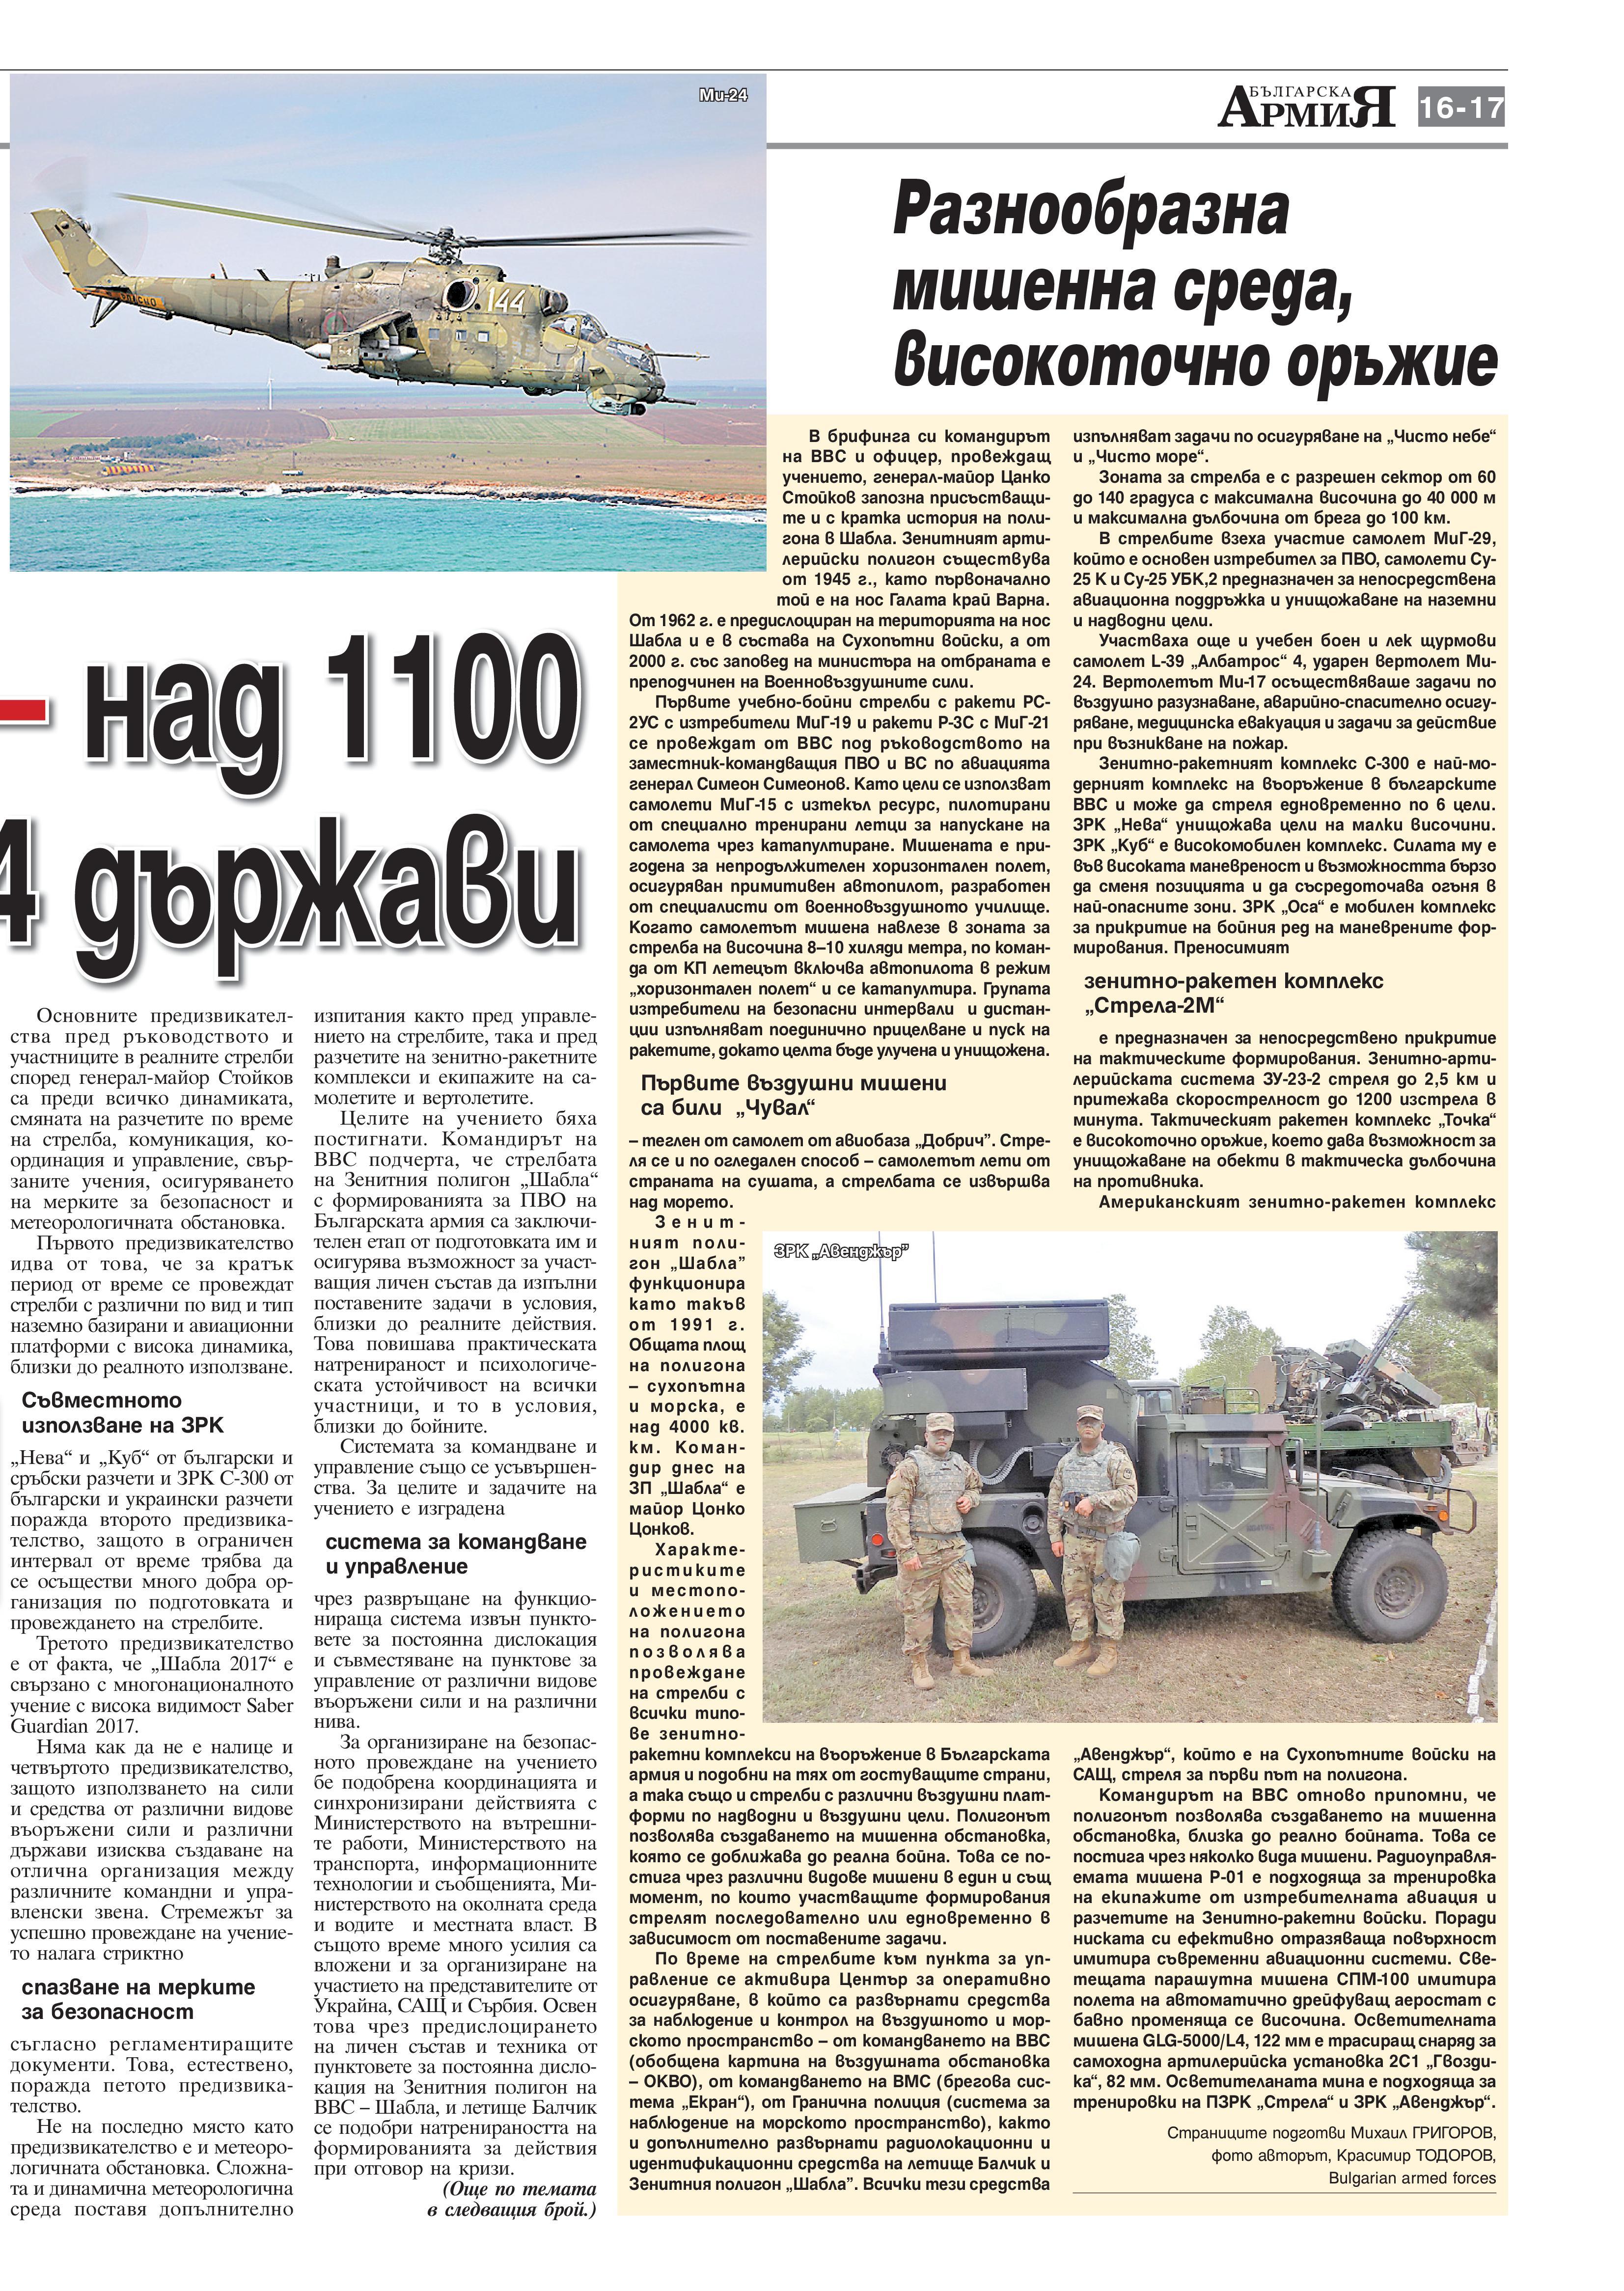 https://www.armymedia.bg/wp-content/uploads/2015/06/17-7.jpg